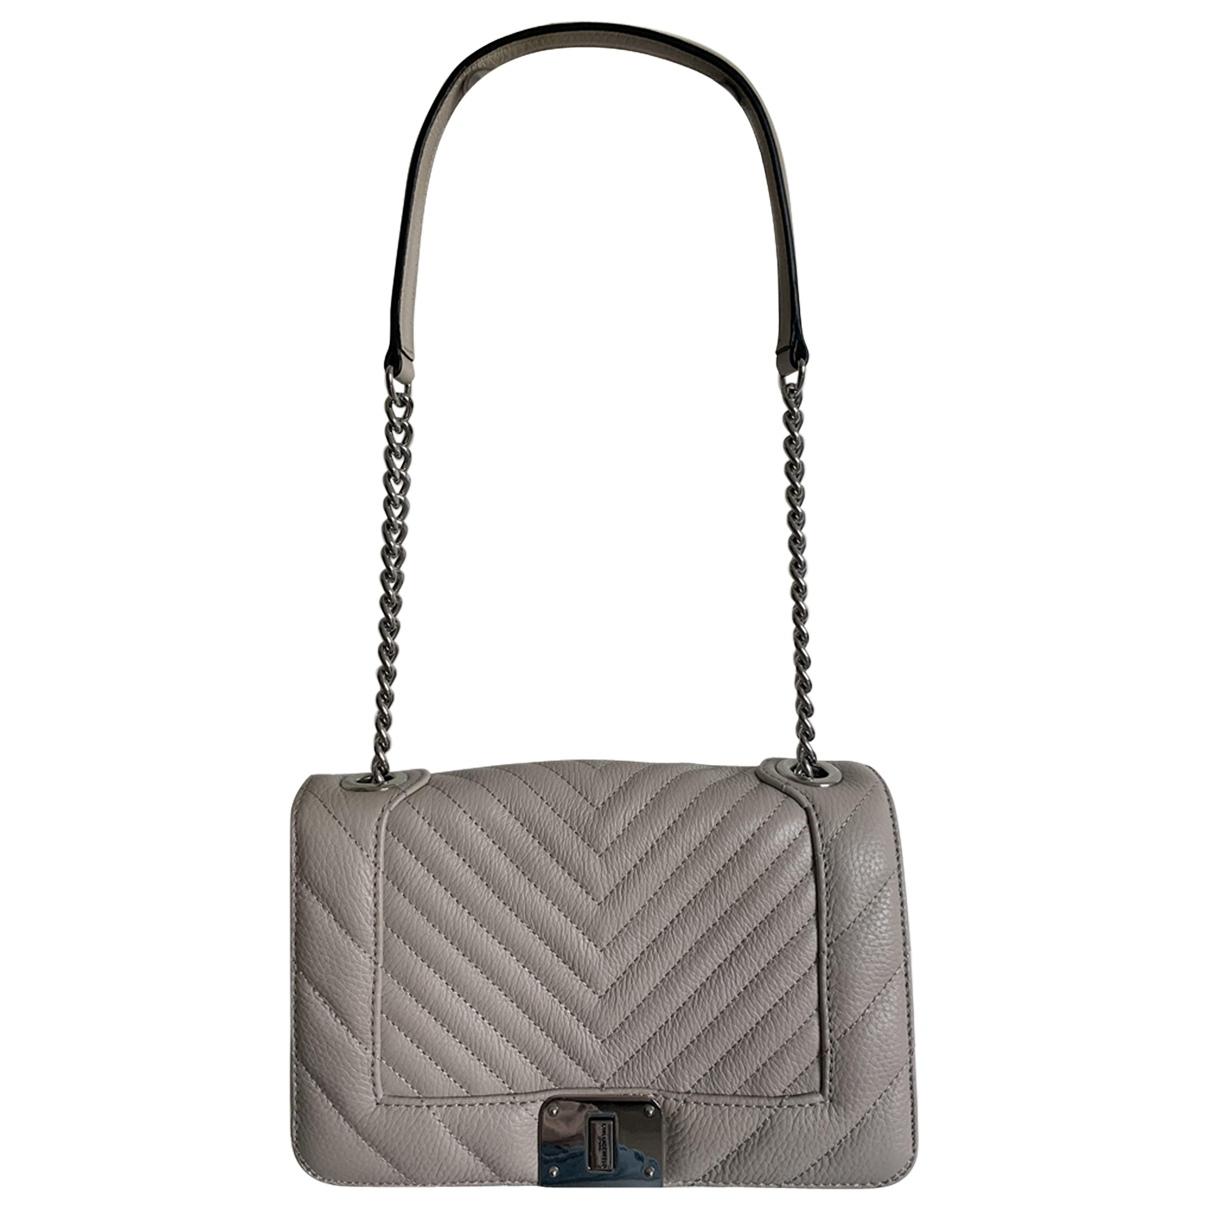 Karl Lagerfeld \N Beige Leather handbag for Women \N